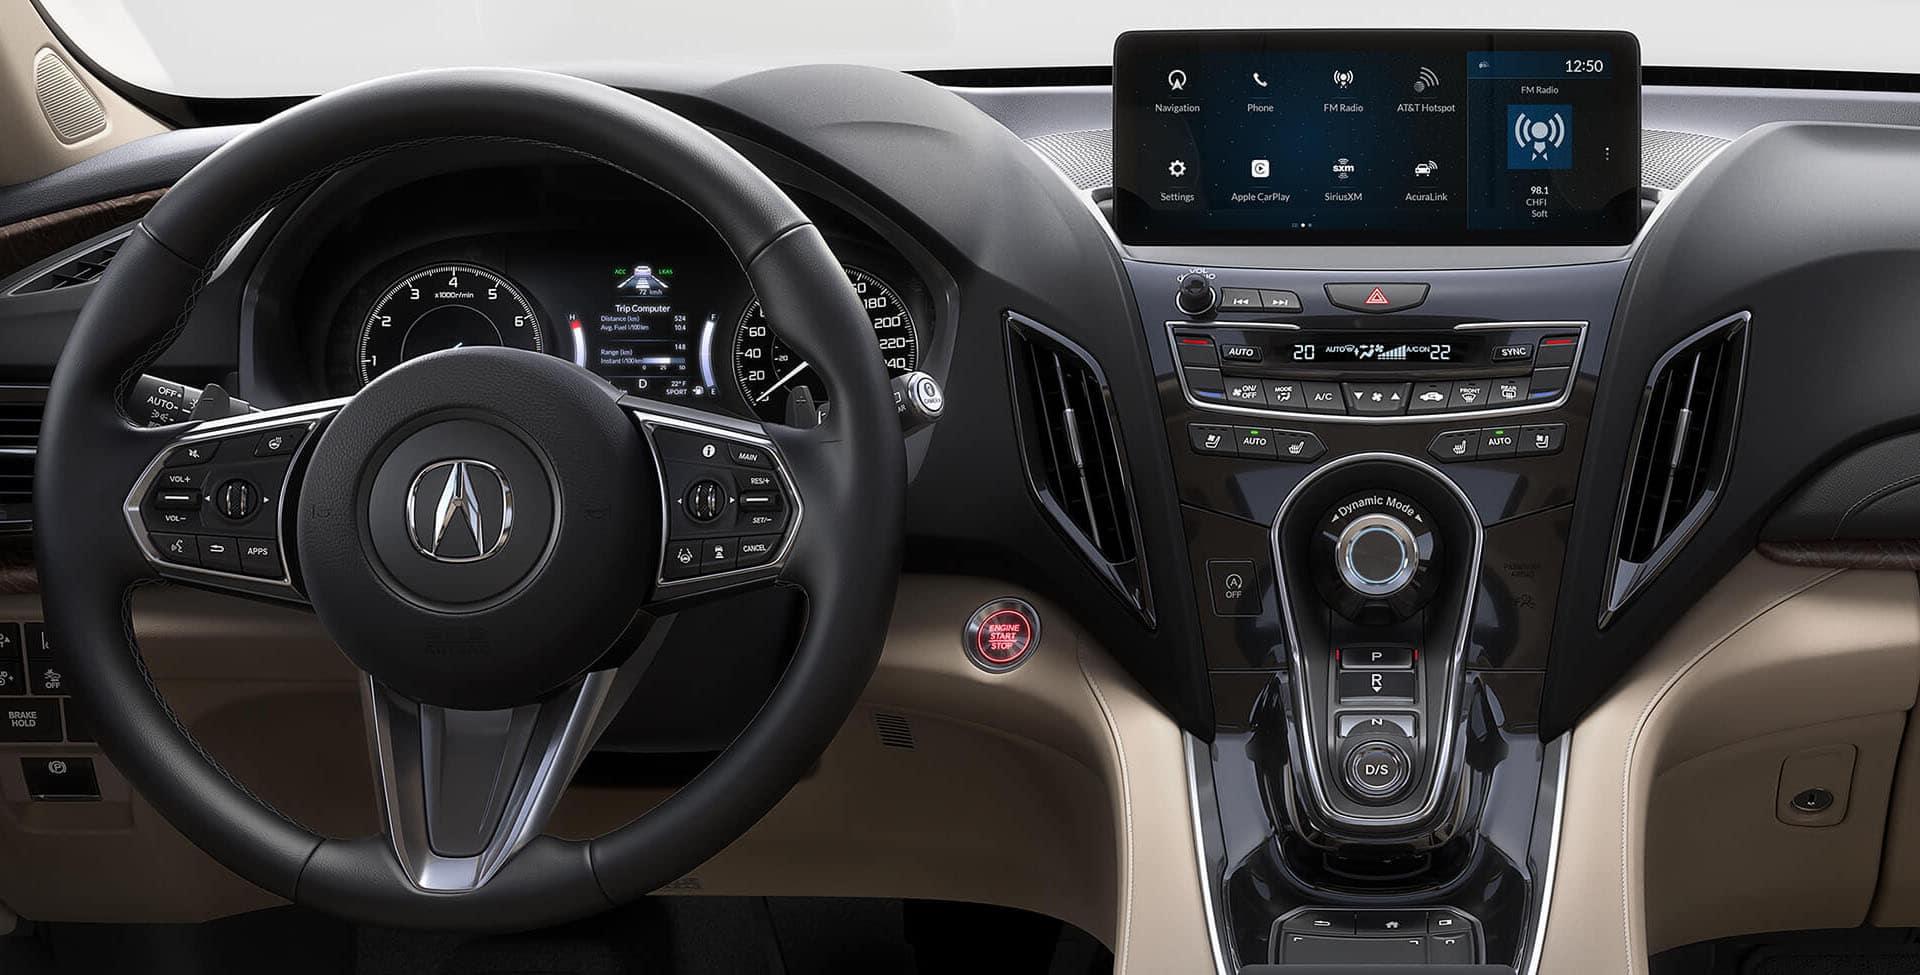 Acura RDX interior options